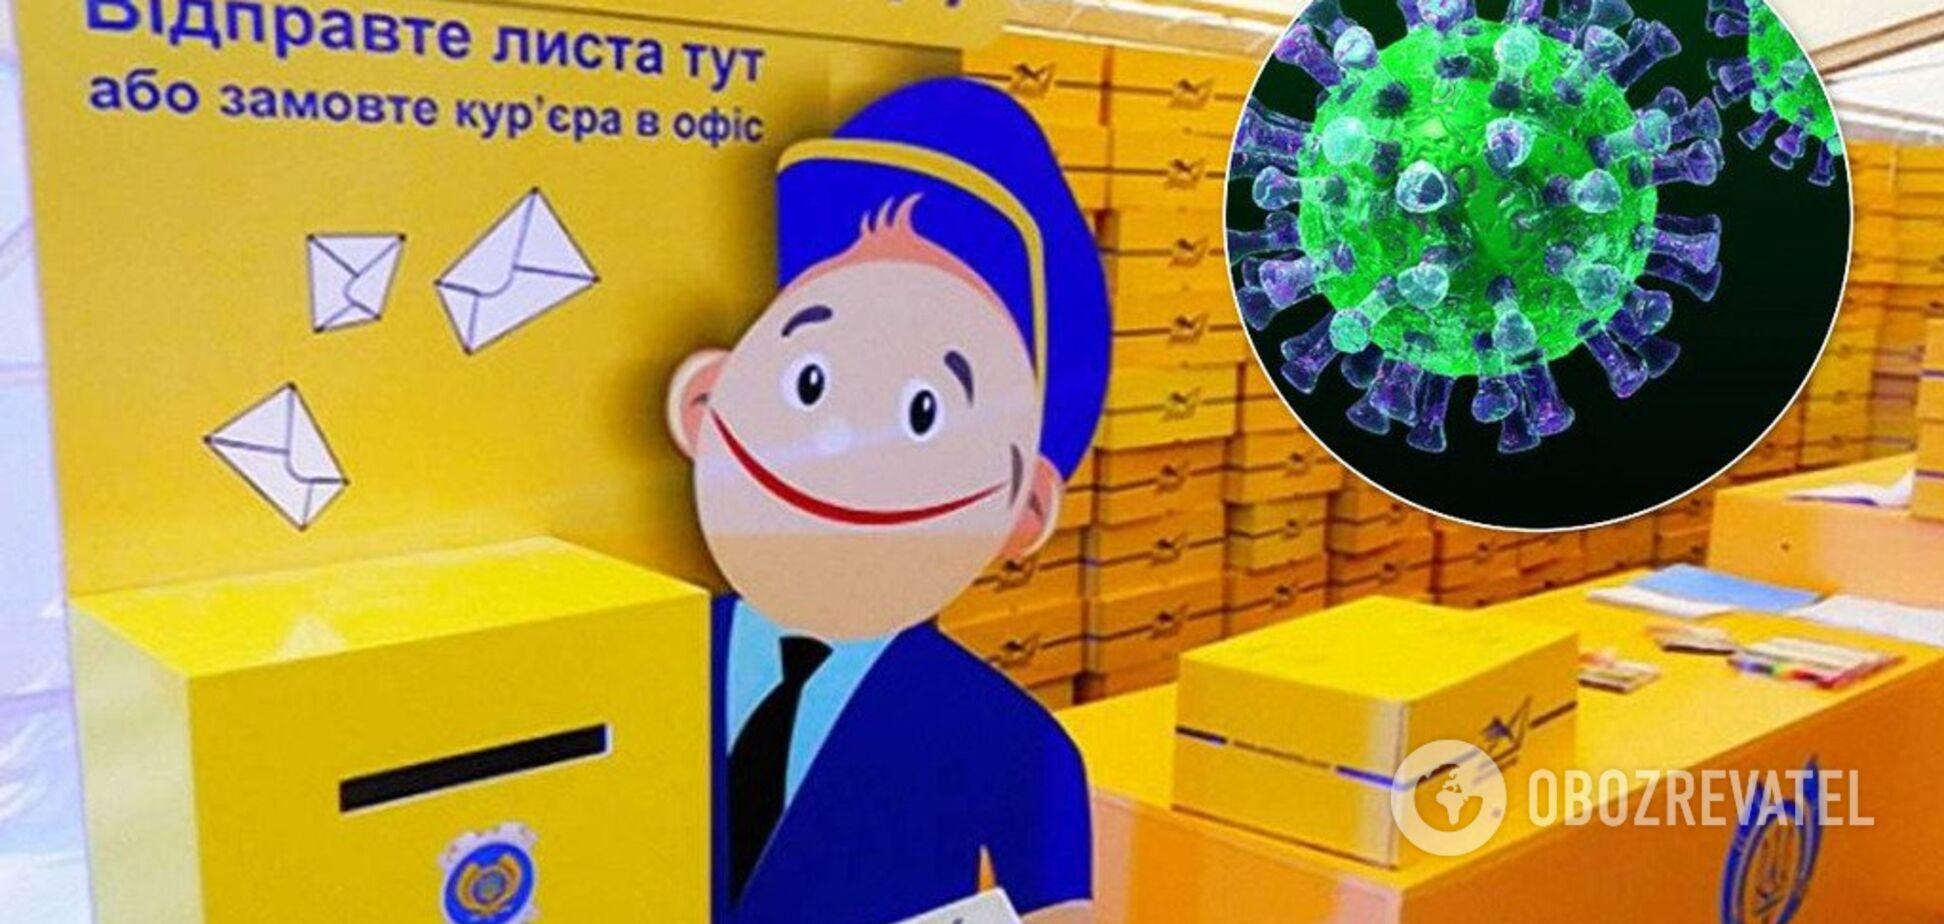 Из-за коронавируса: 'Укрпочта' объявила о задержке посылок из Китая